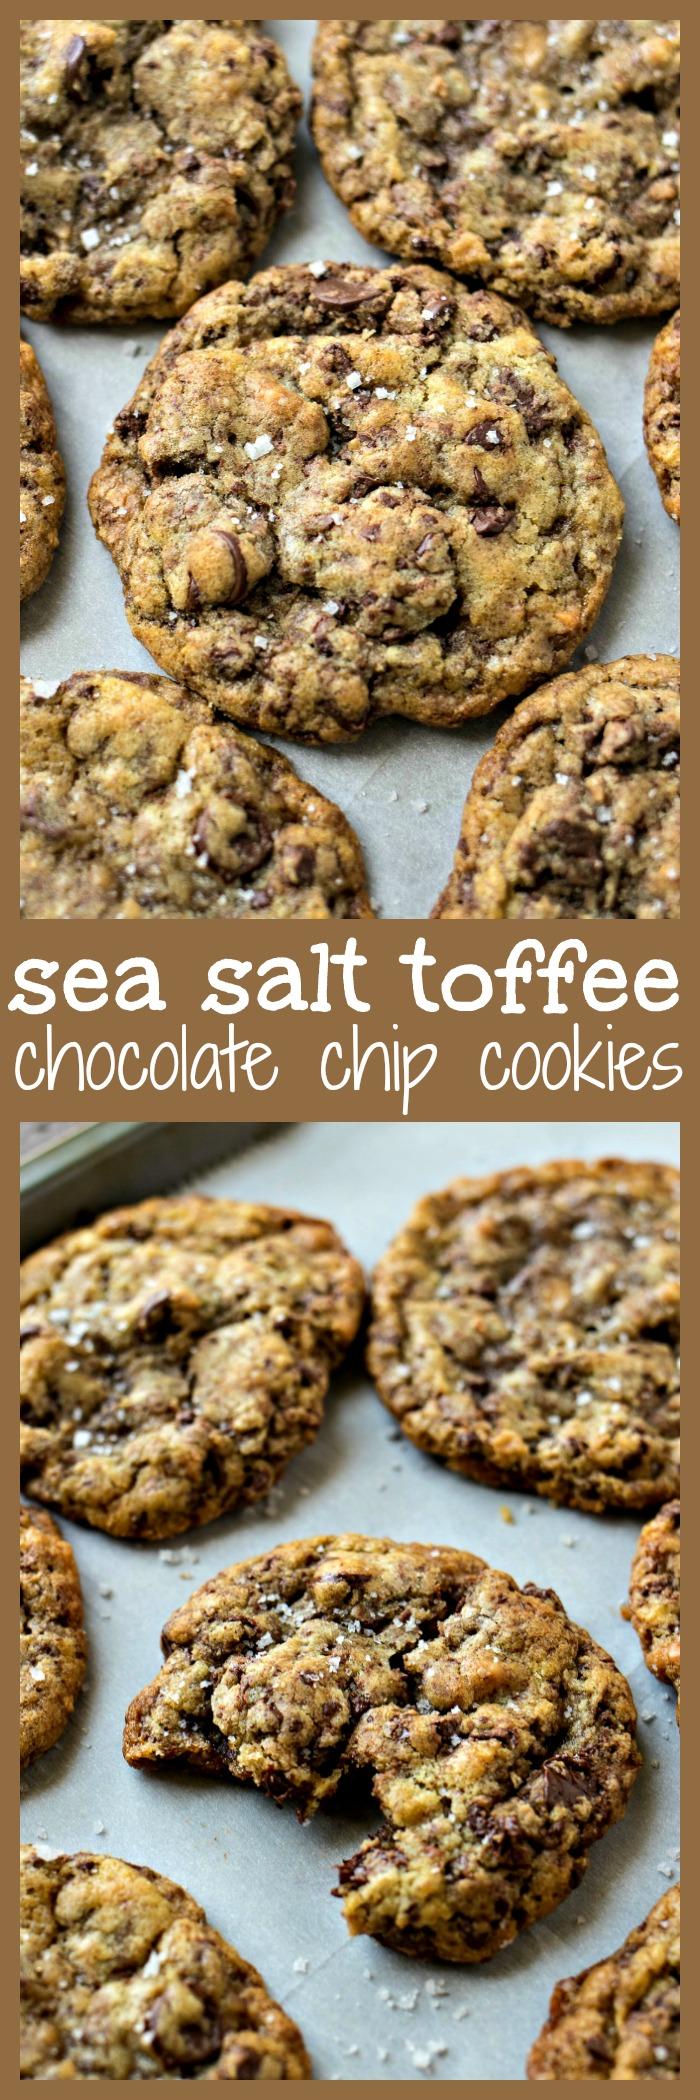 Sea Salt Toffee Chocolate Chip Cookies photo collage